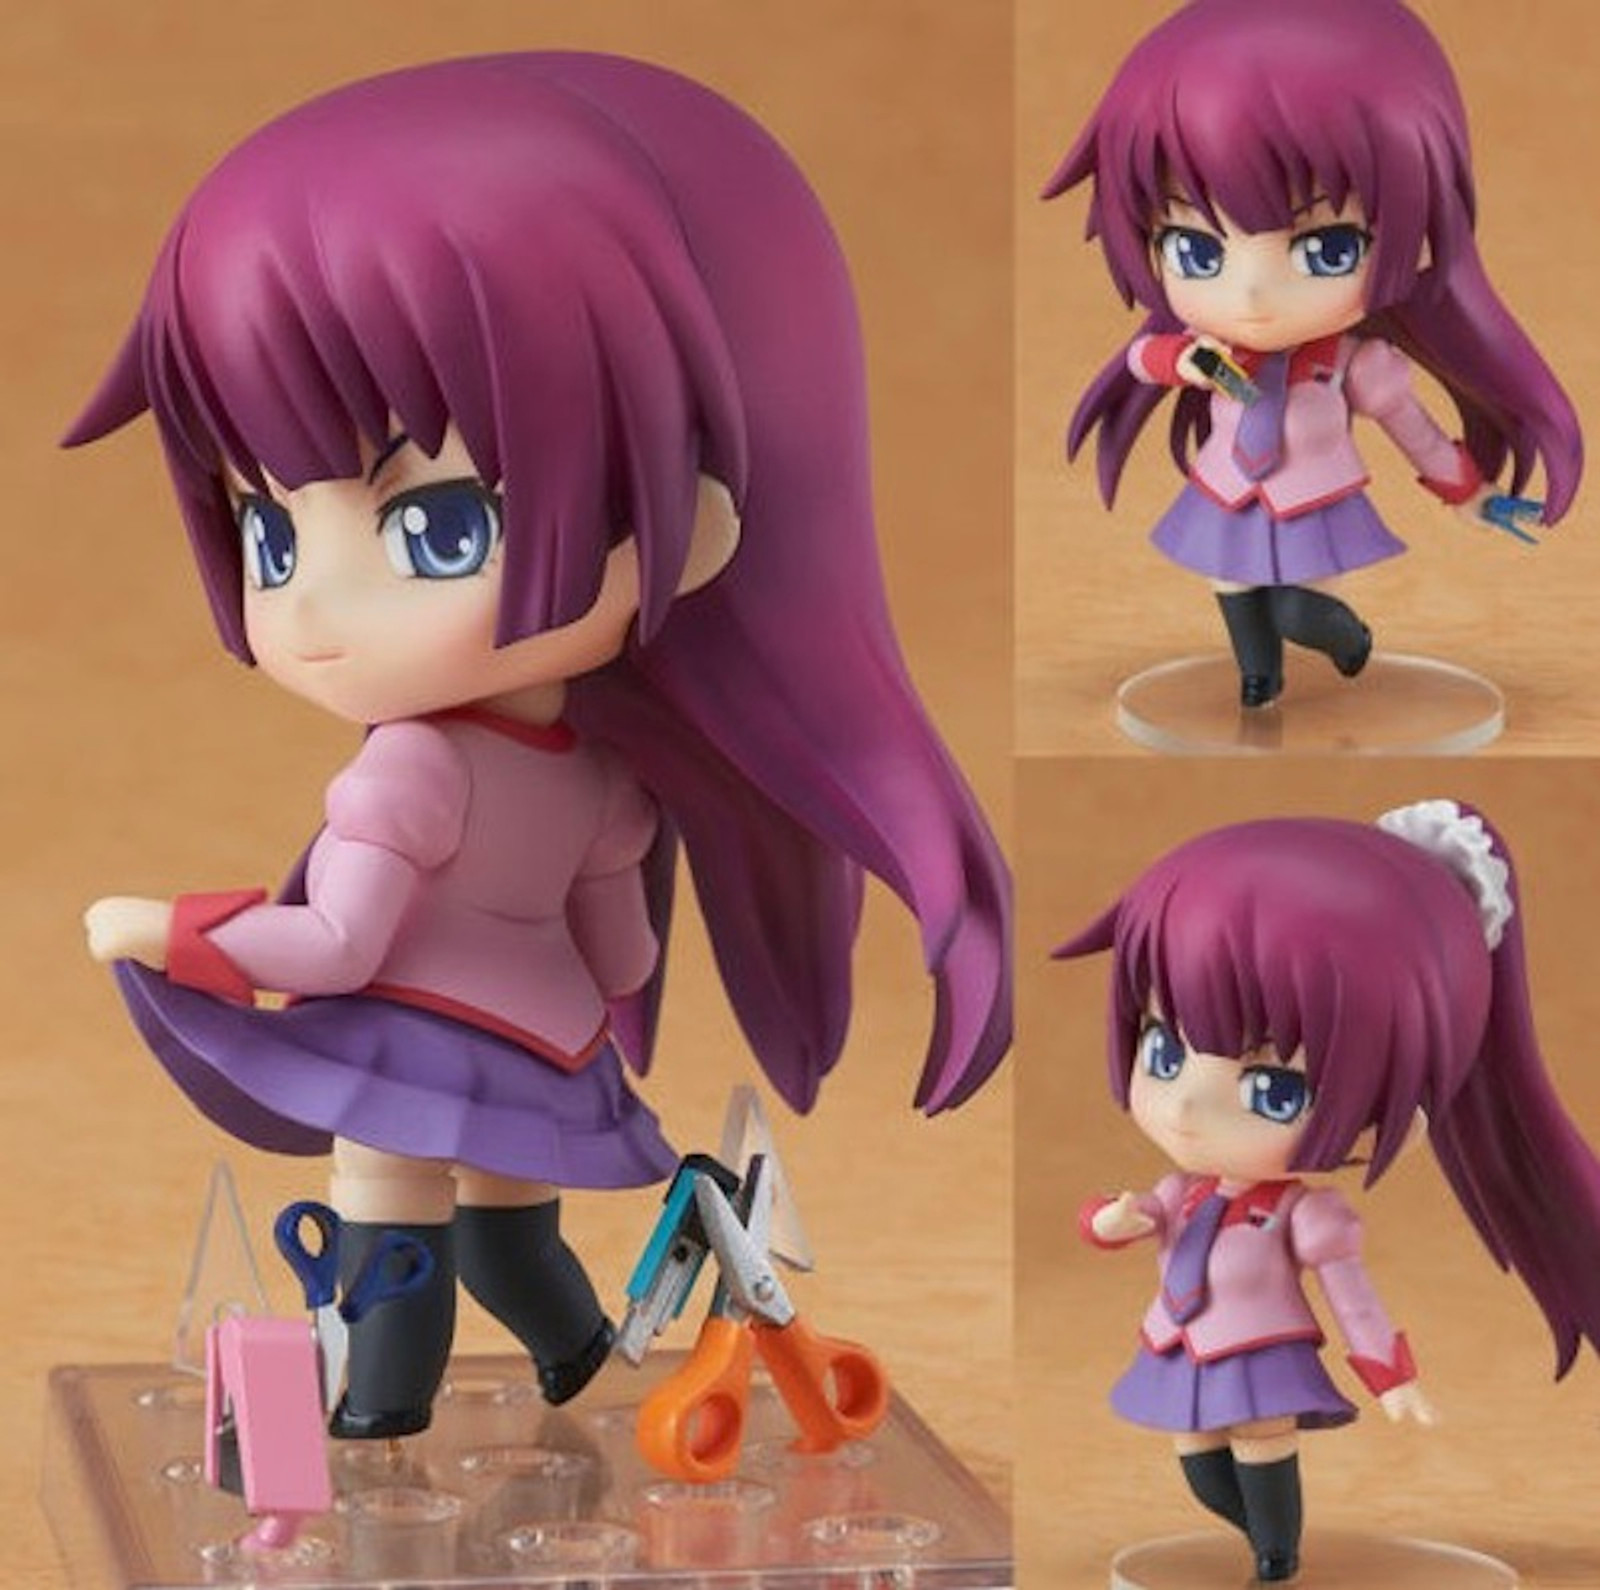 Bakemonogatari Senjogahara Hitagi Premium Box Set Nendoroid Figure JAPAN ANIME Tracking number: